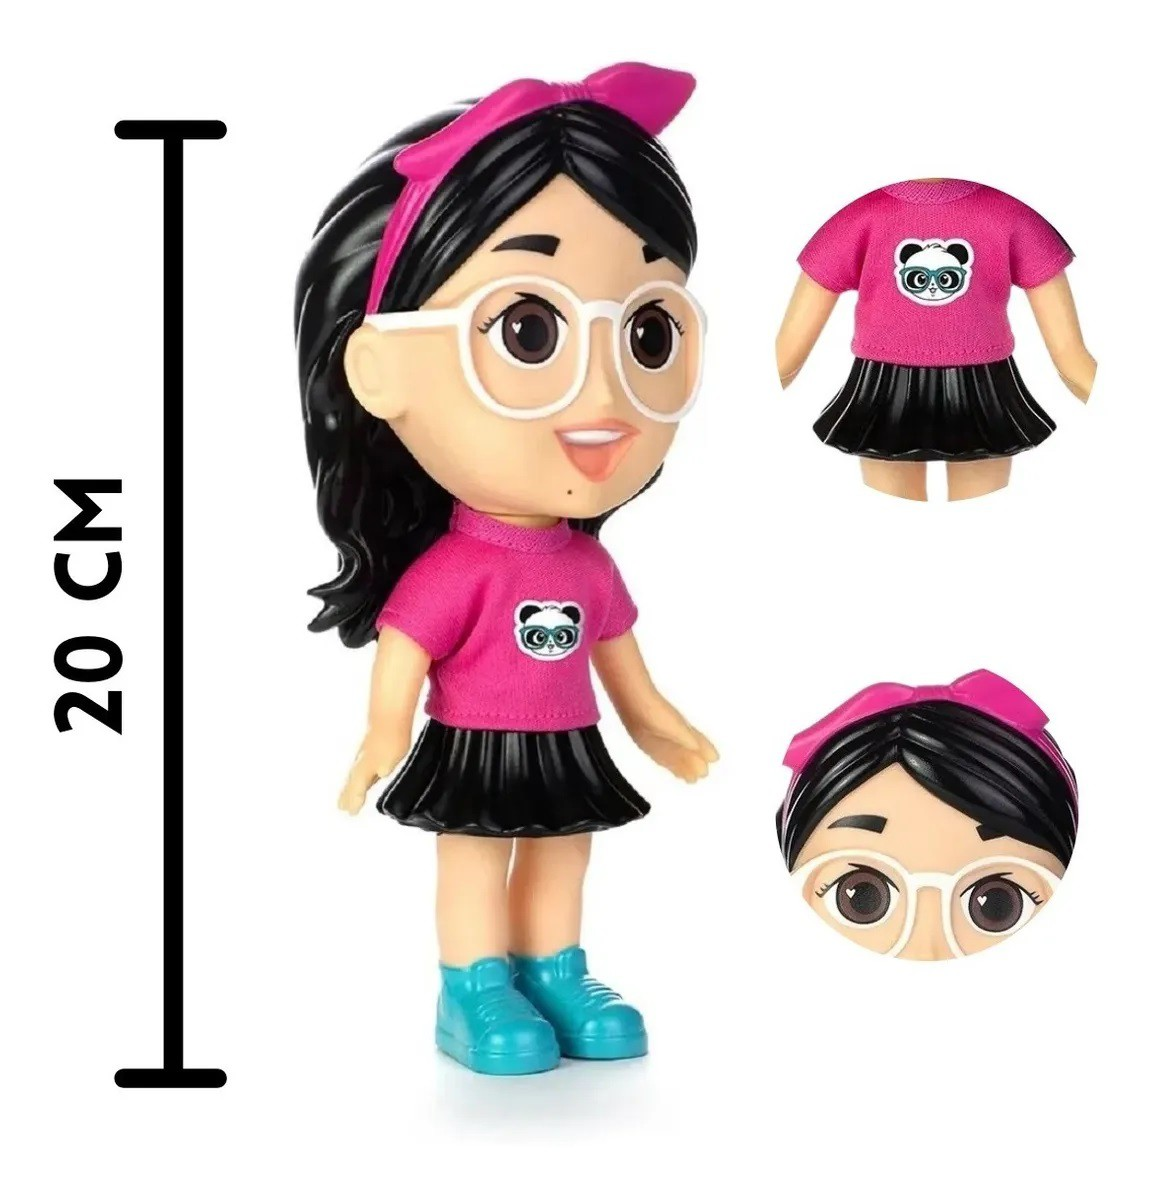 Boneca Luluca  20 Cm - Estrela